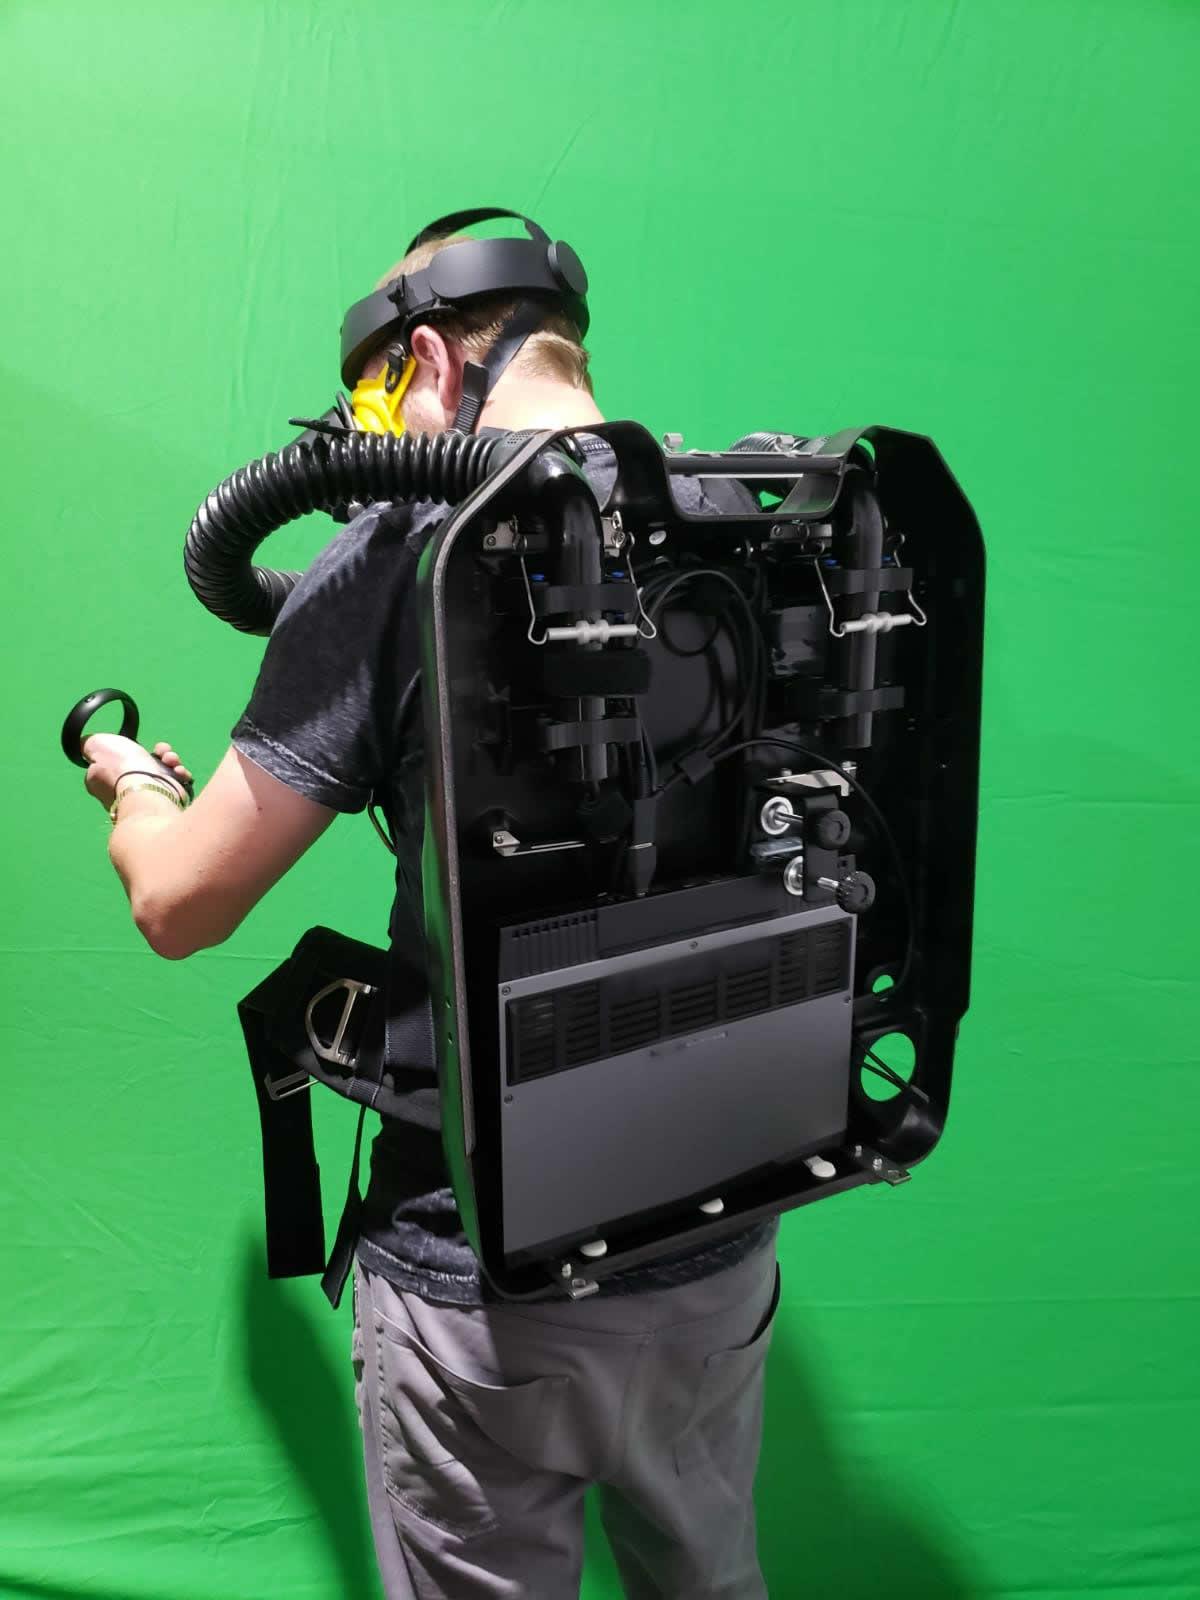 VR/PC Integration into BG4 Rebreather shell